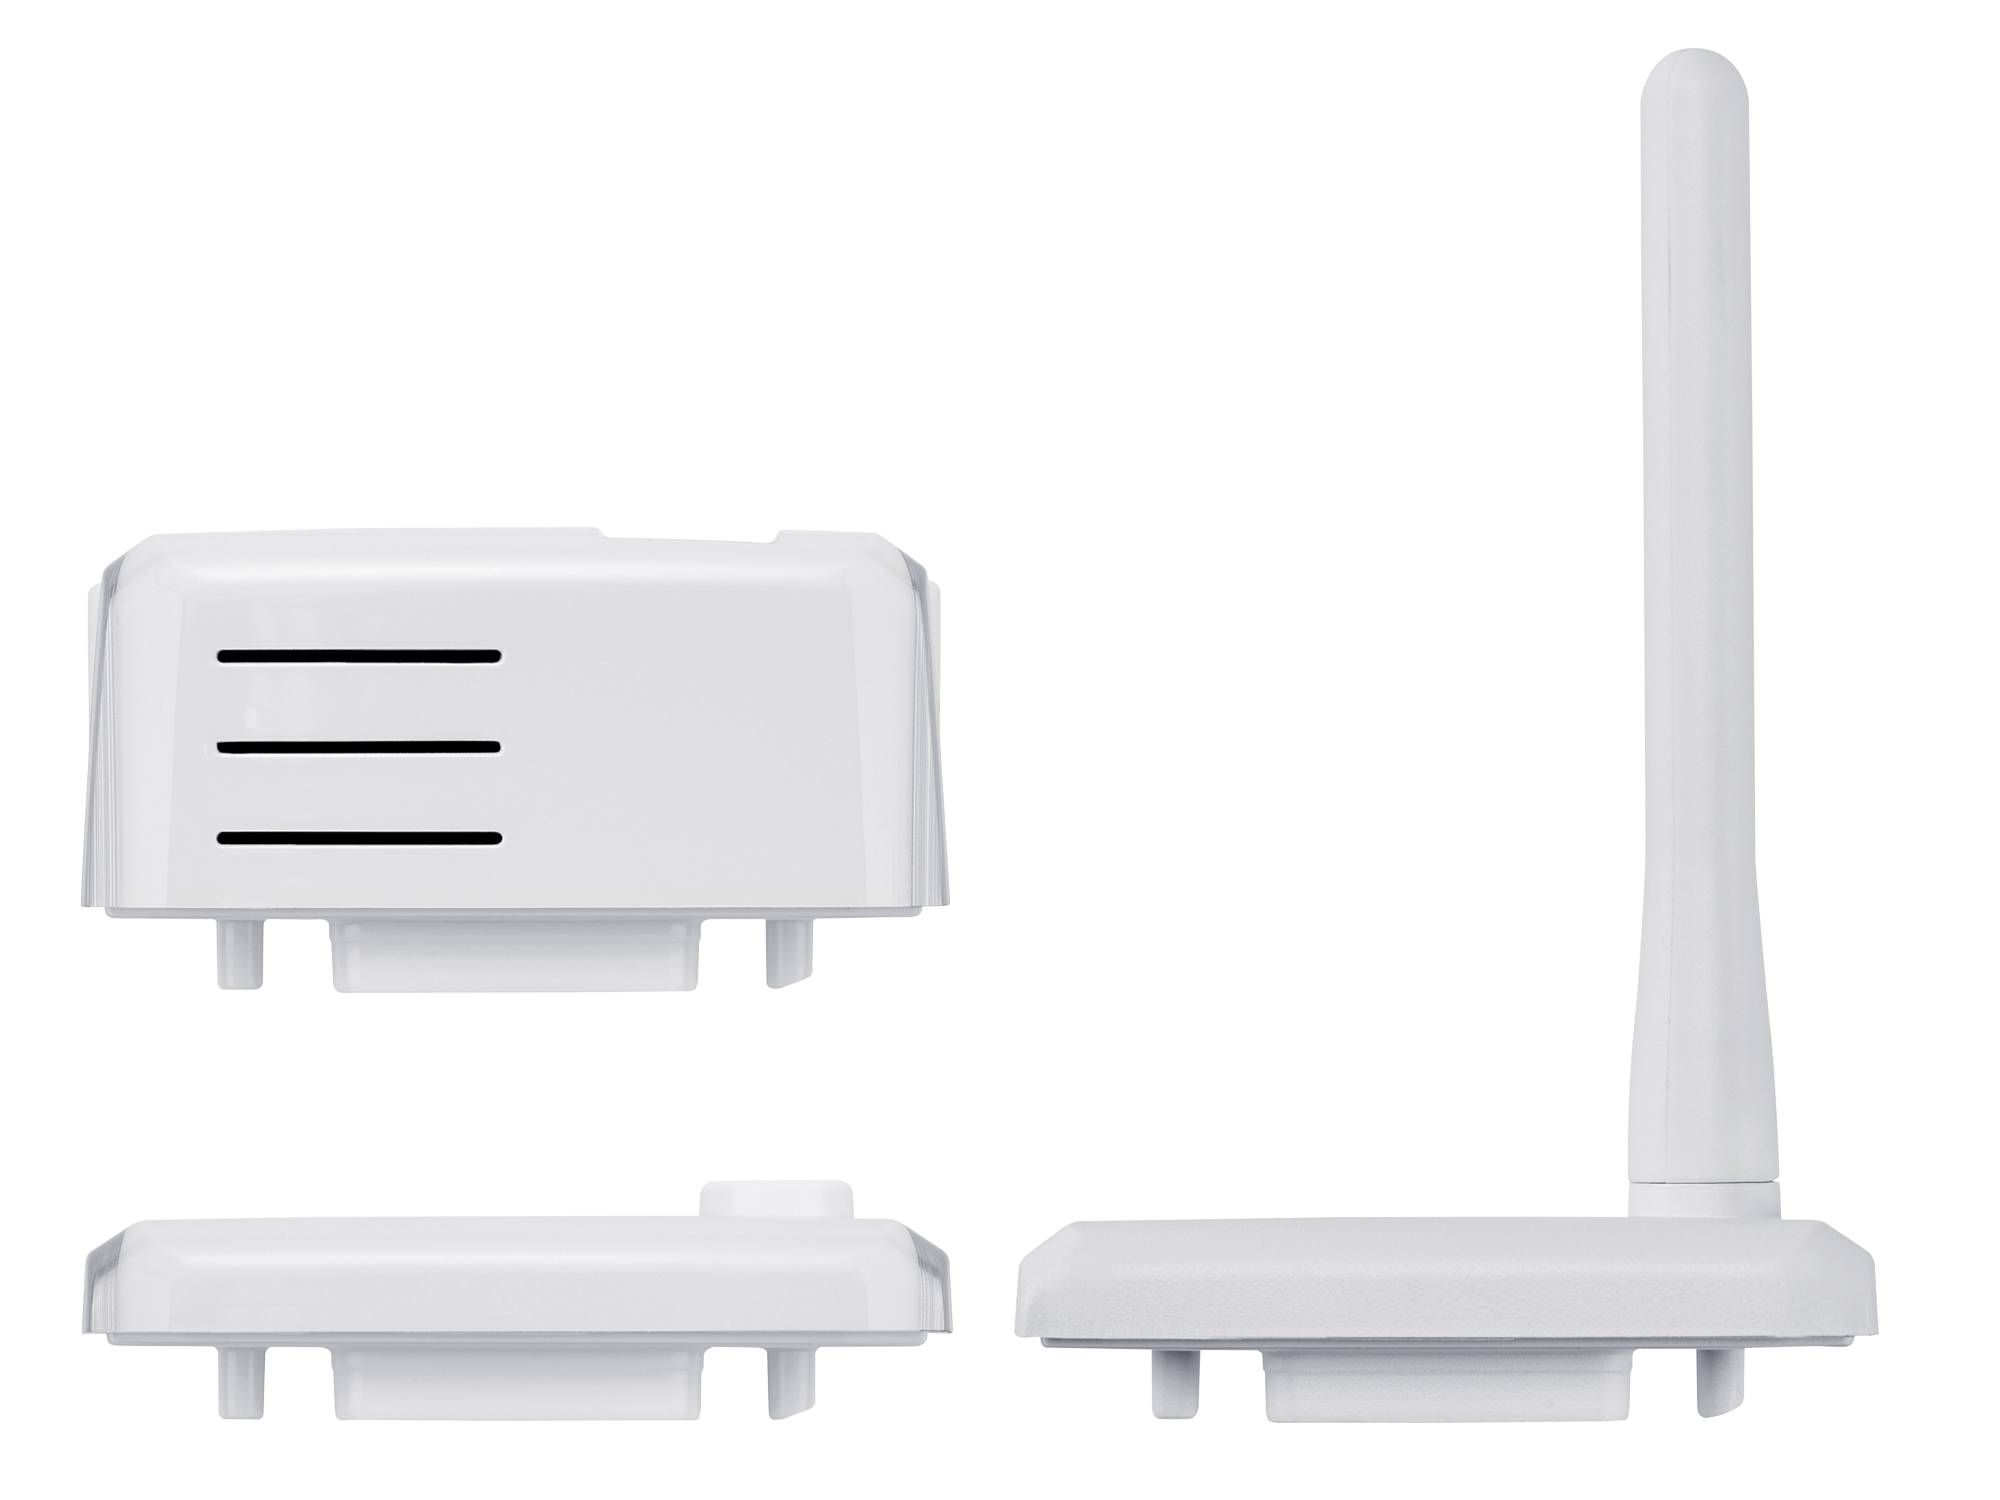 testo Saveris 生命科学环境监测系统——通信组件